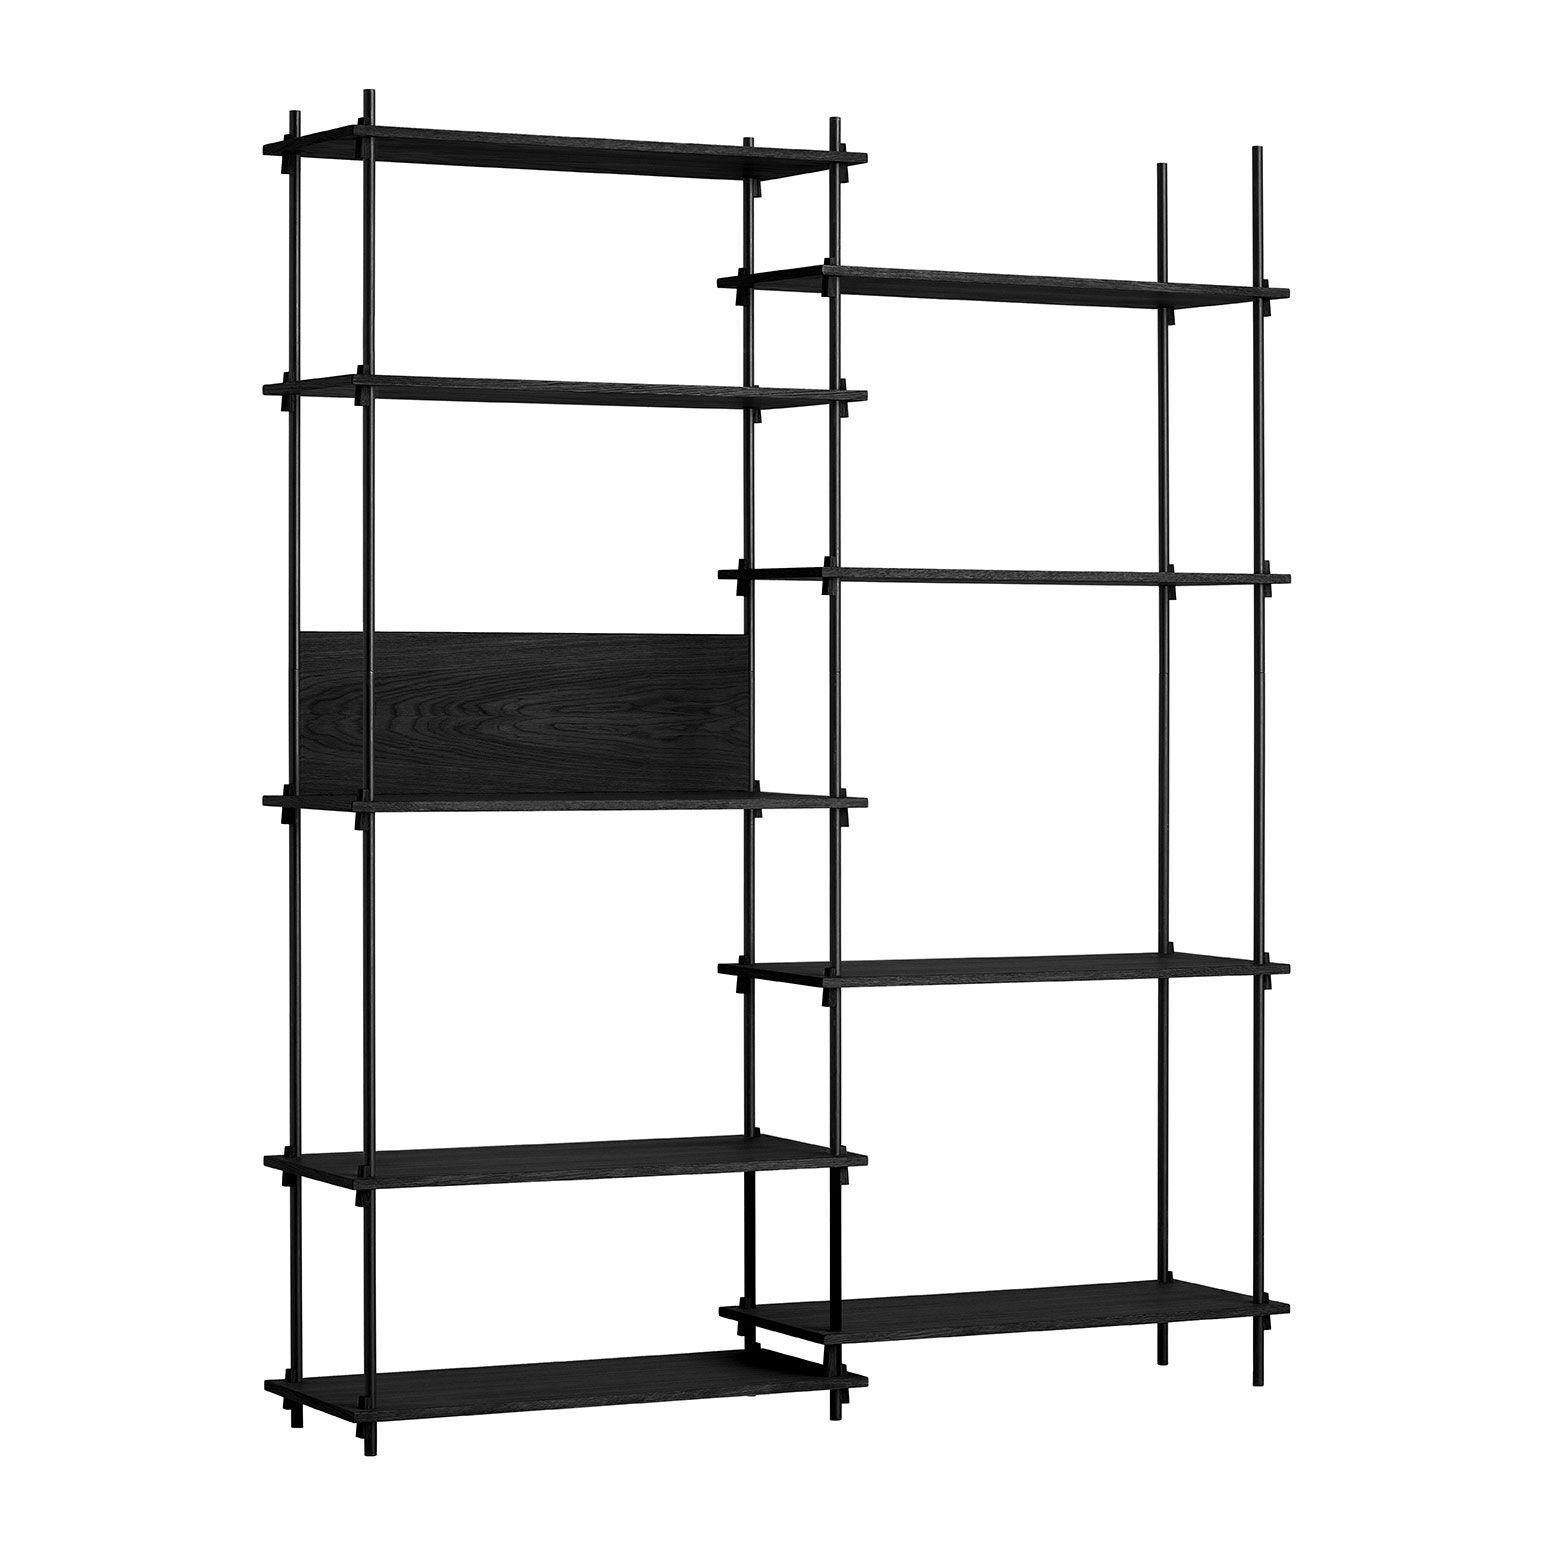 MOEBE Shelving System Shelf Tall Double, Black